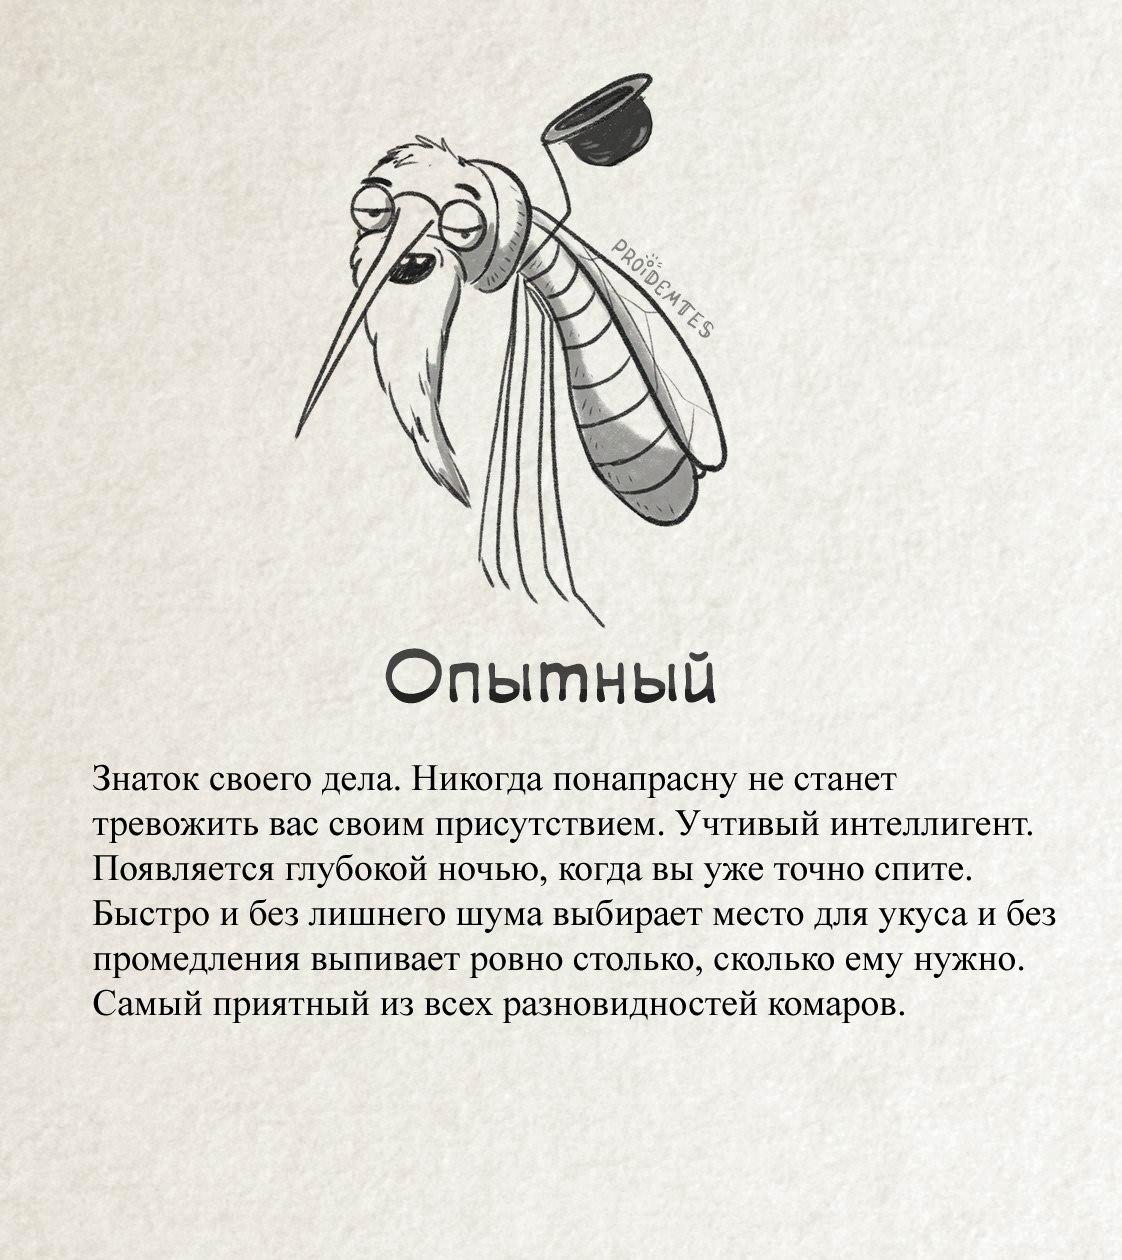 Комар «Опытный»